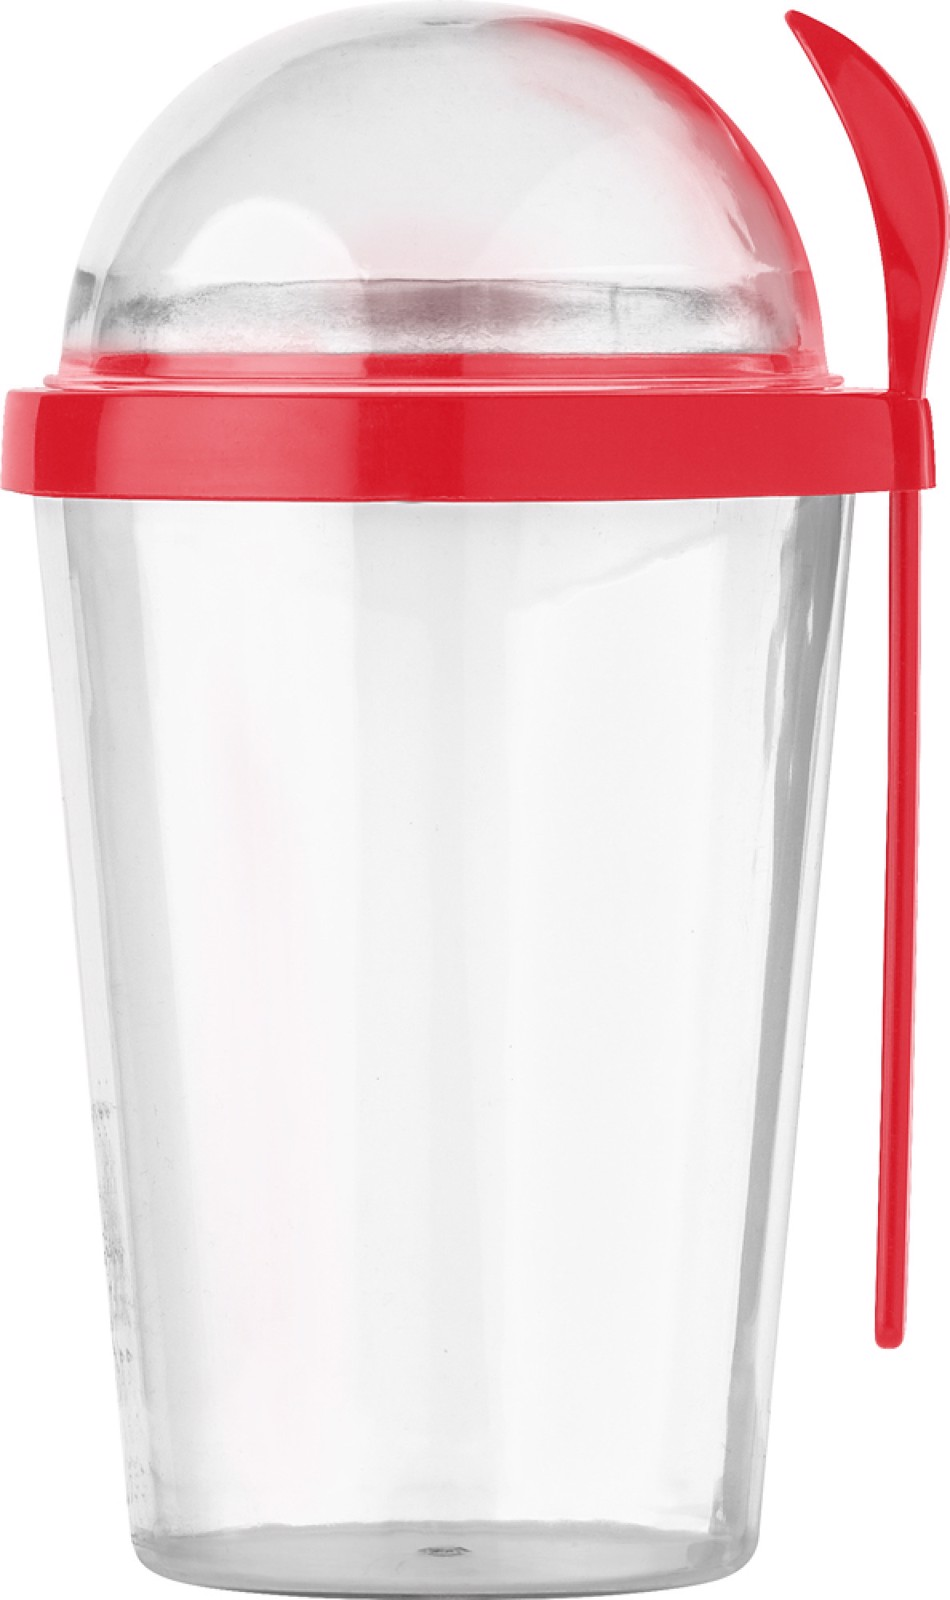 PP breakfast mug - Red